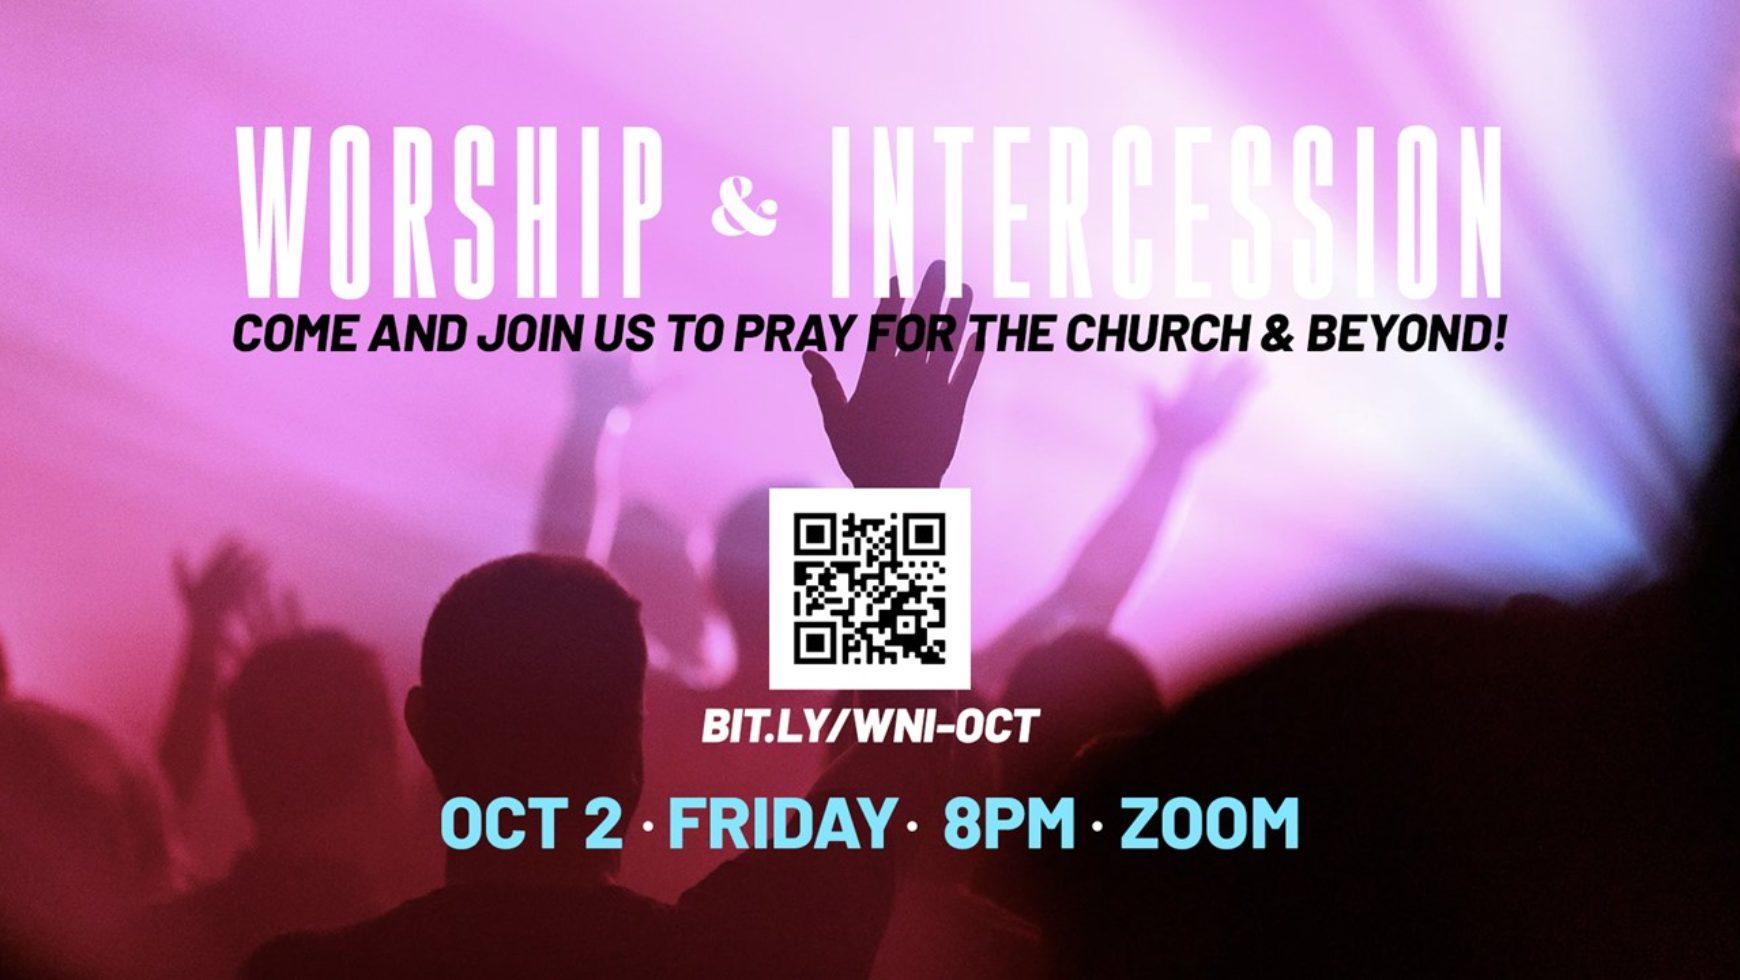 CORPORATE WORSHIP & INTERCESSION (ONLINE)